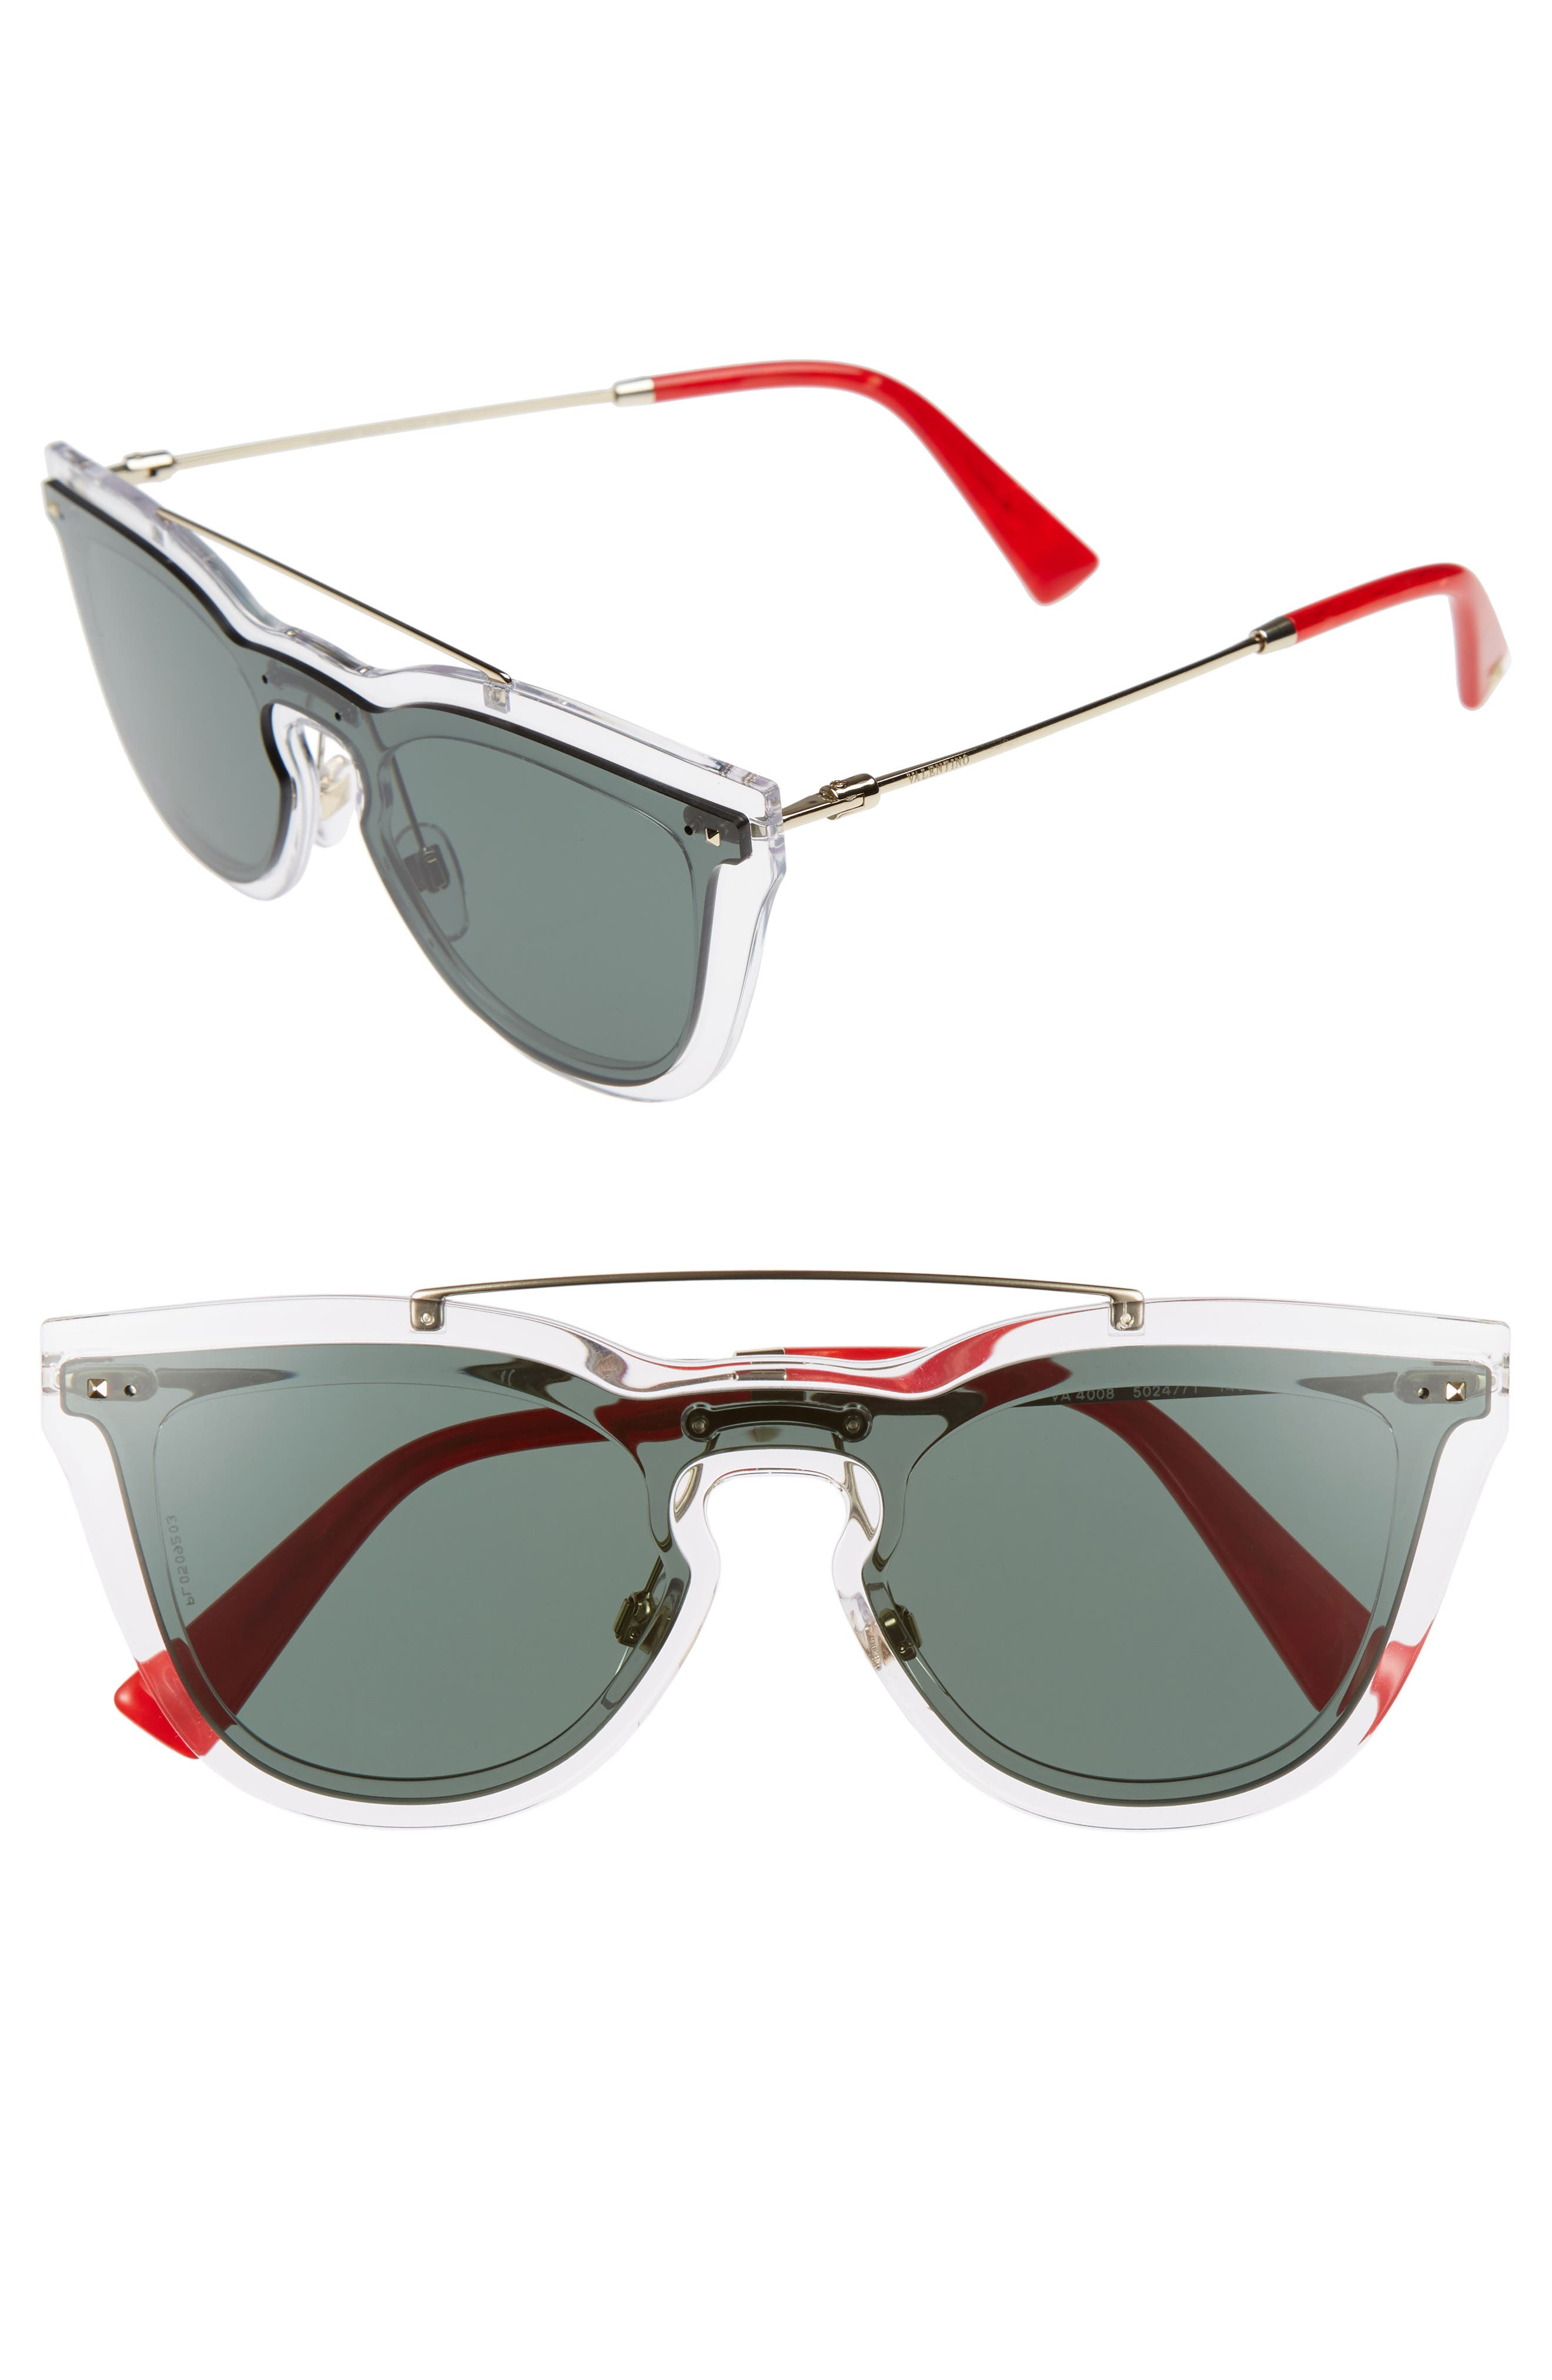 Valentino 48mm Retro Sunglasses